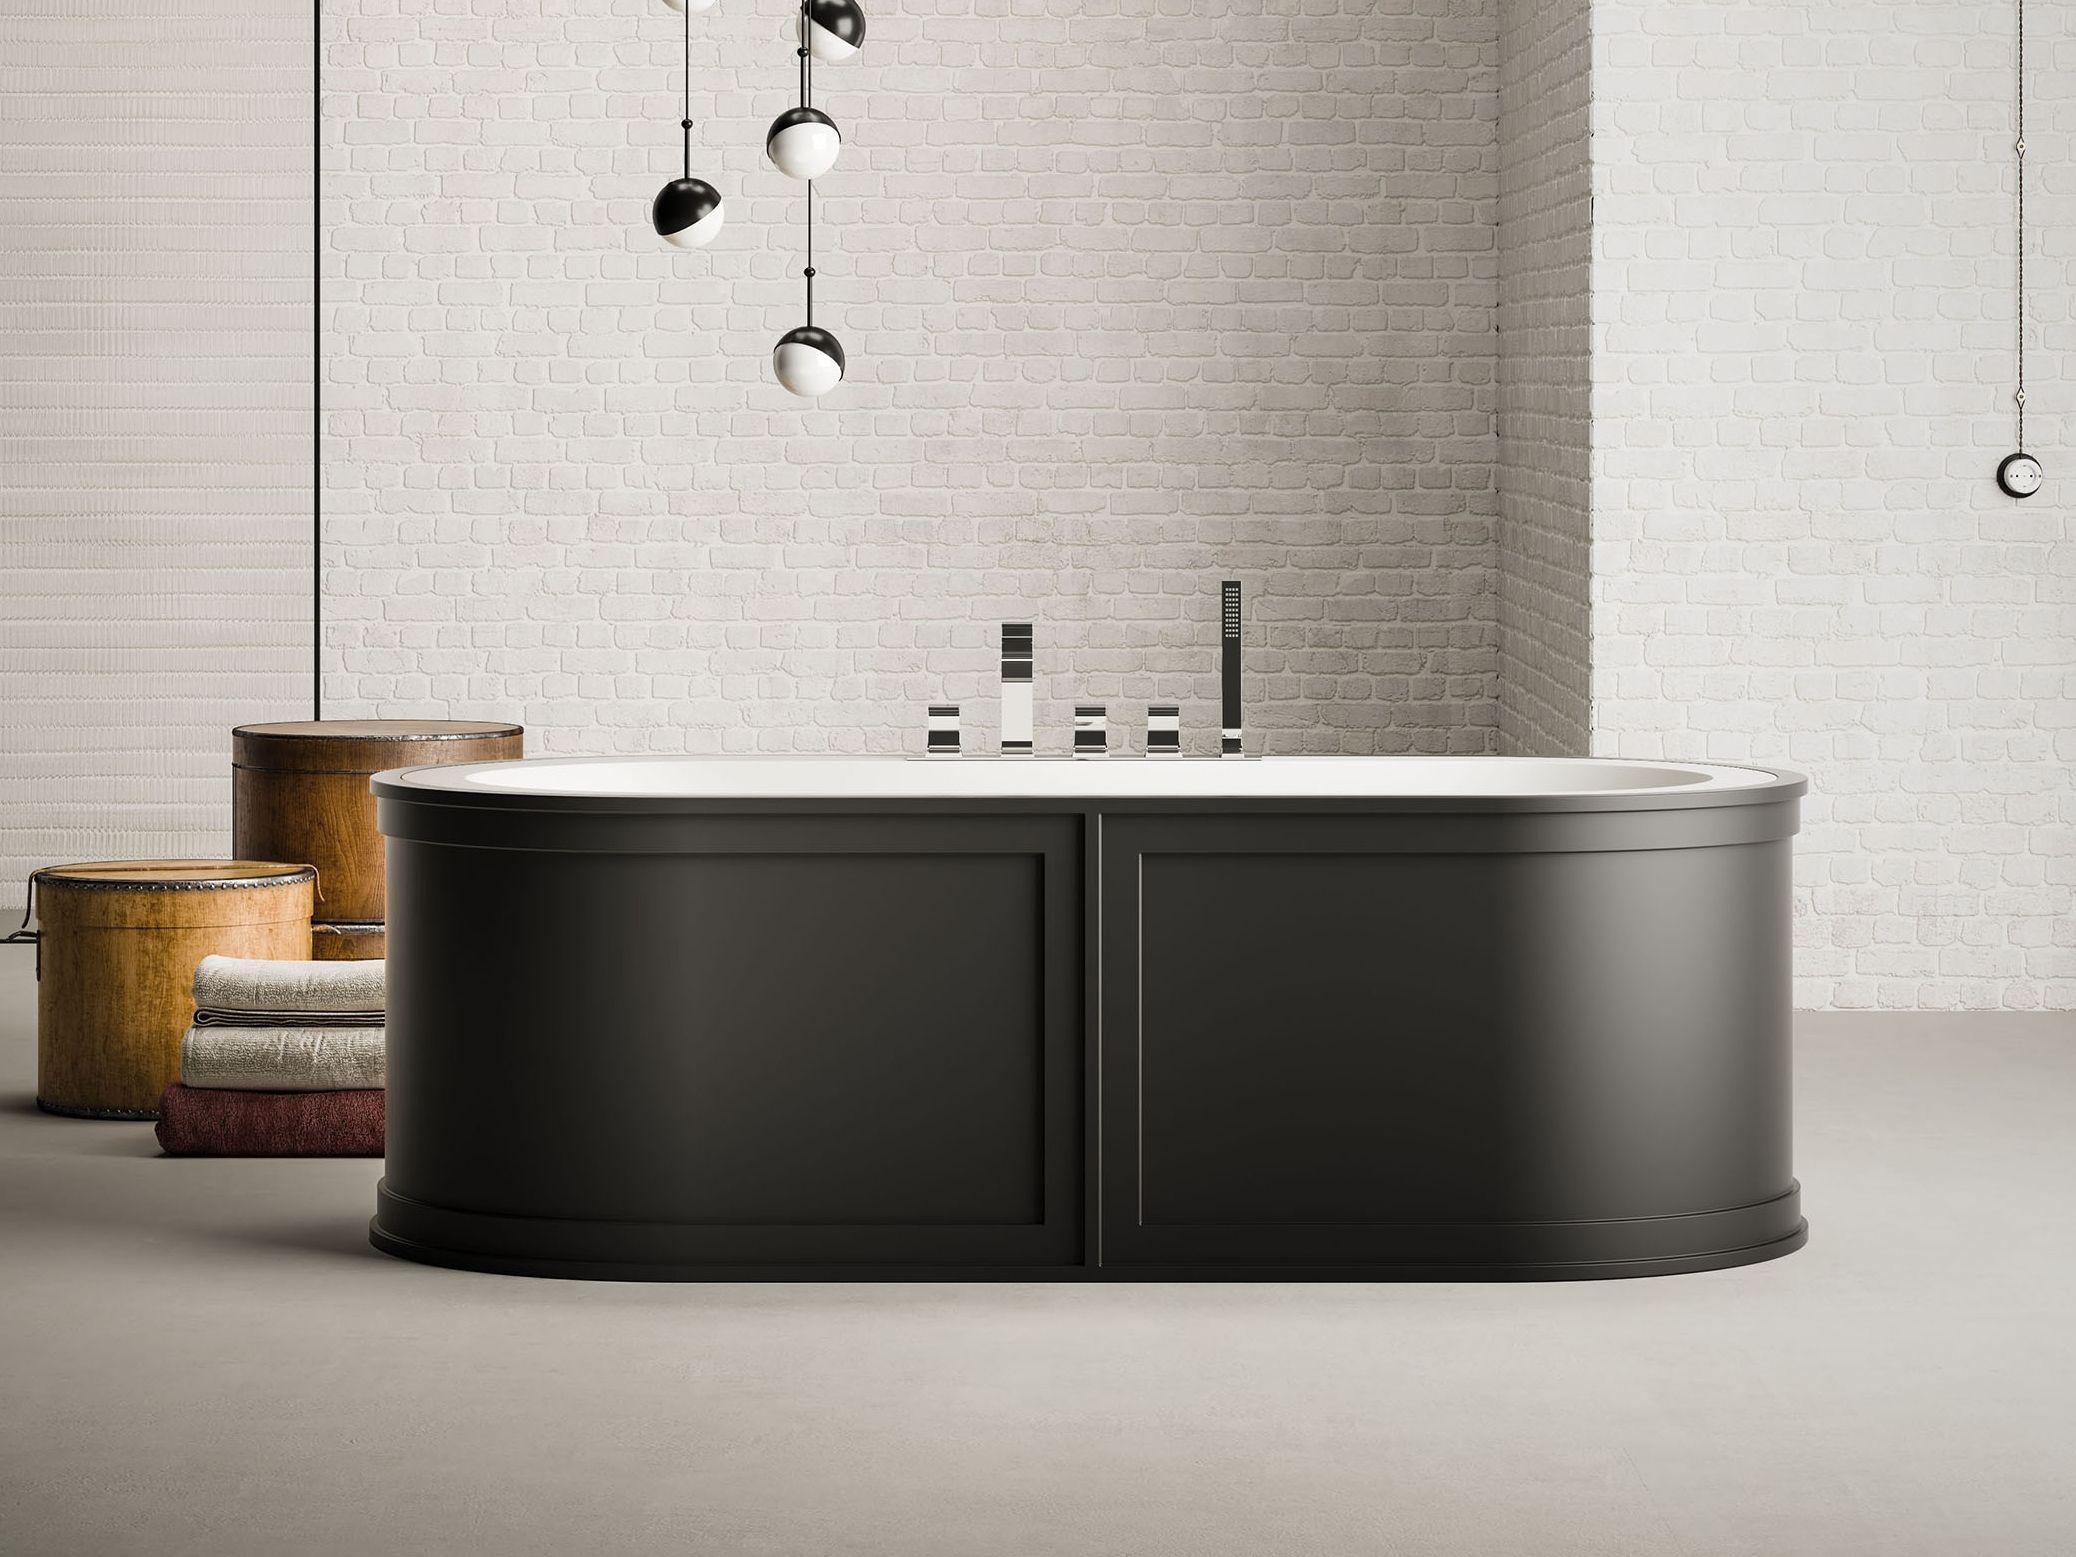 Oval Acrylic Bathtubs | Archiproducts